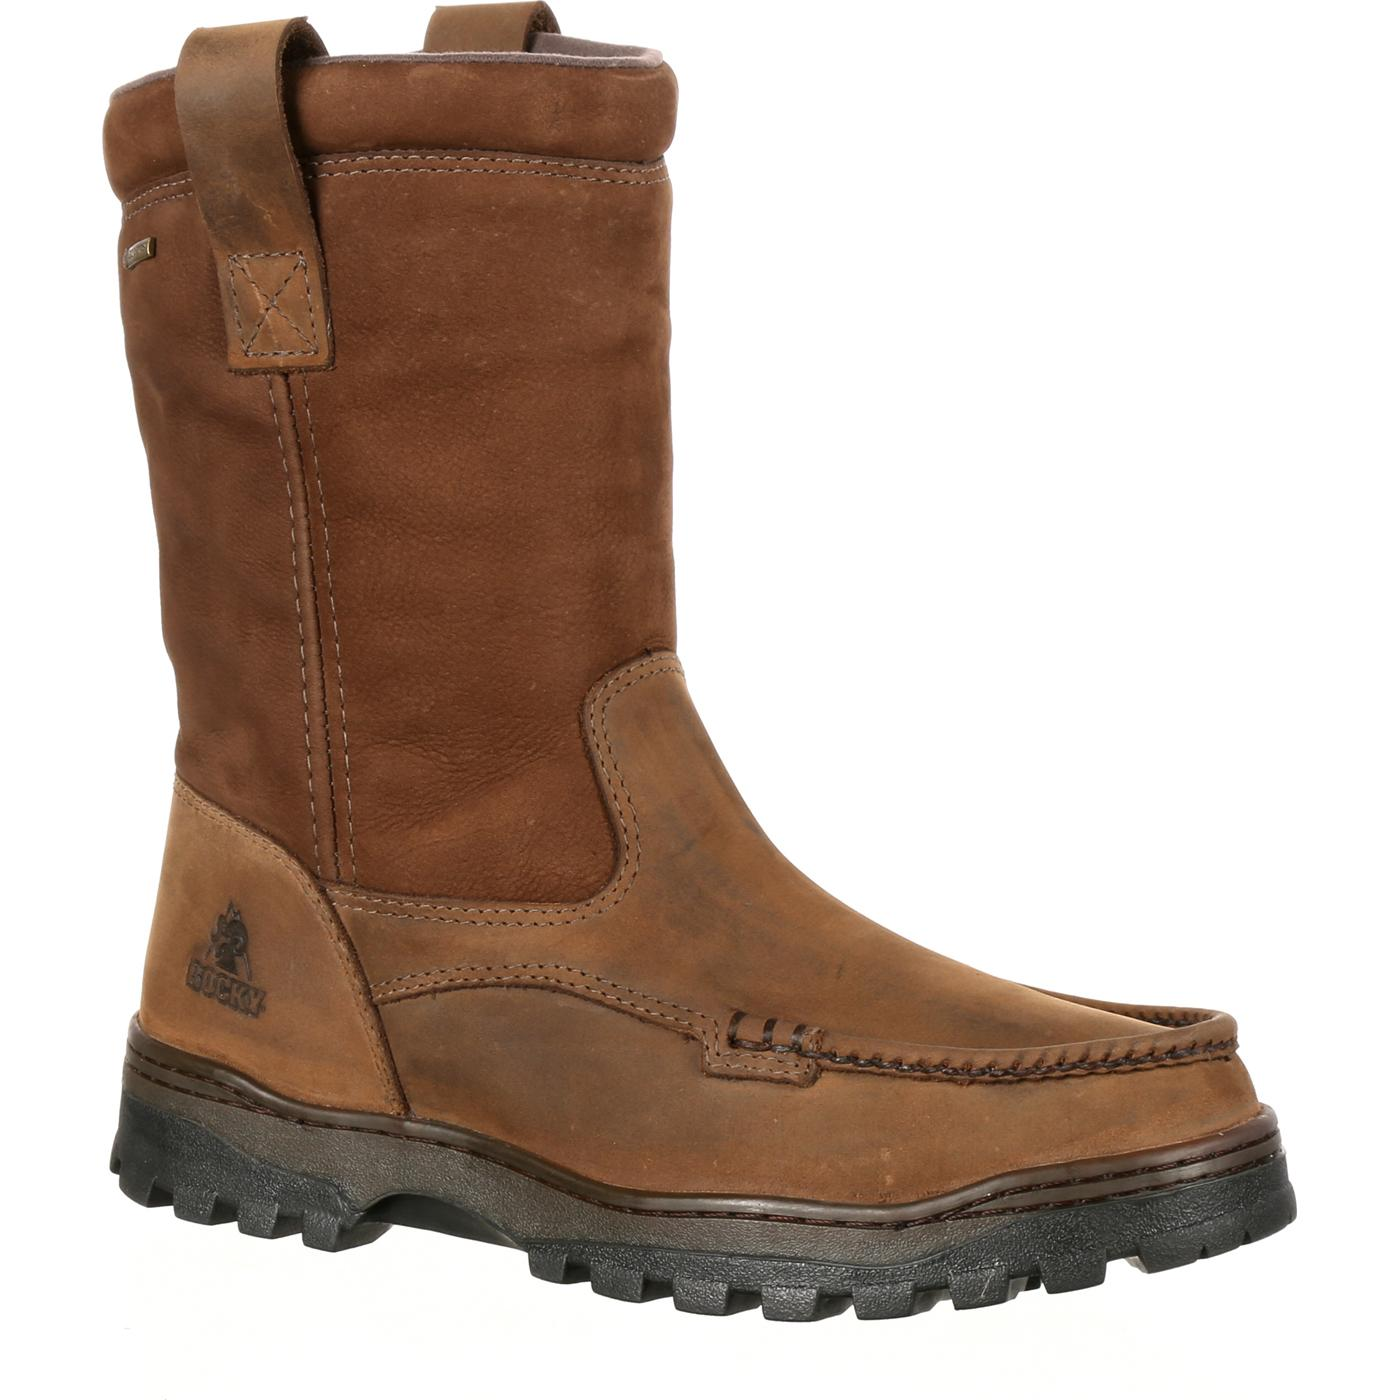 Rocky Outback Gore Tex Waterproof Wellington Moc Toe Boot